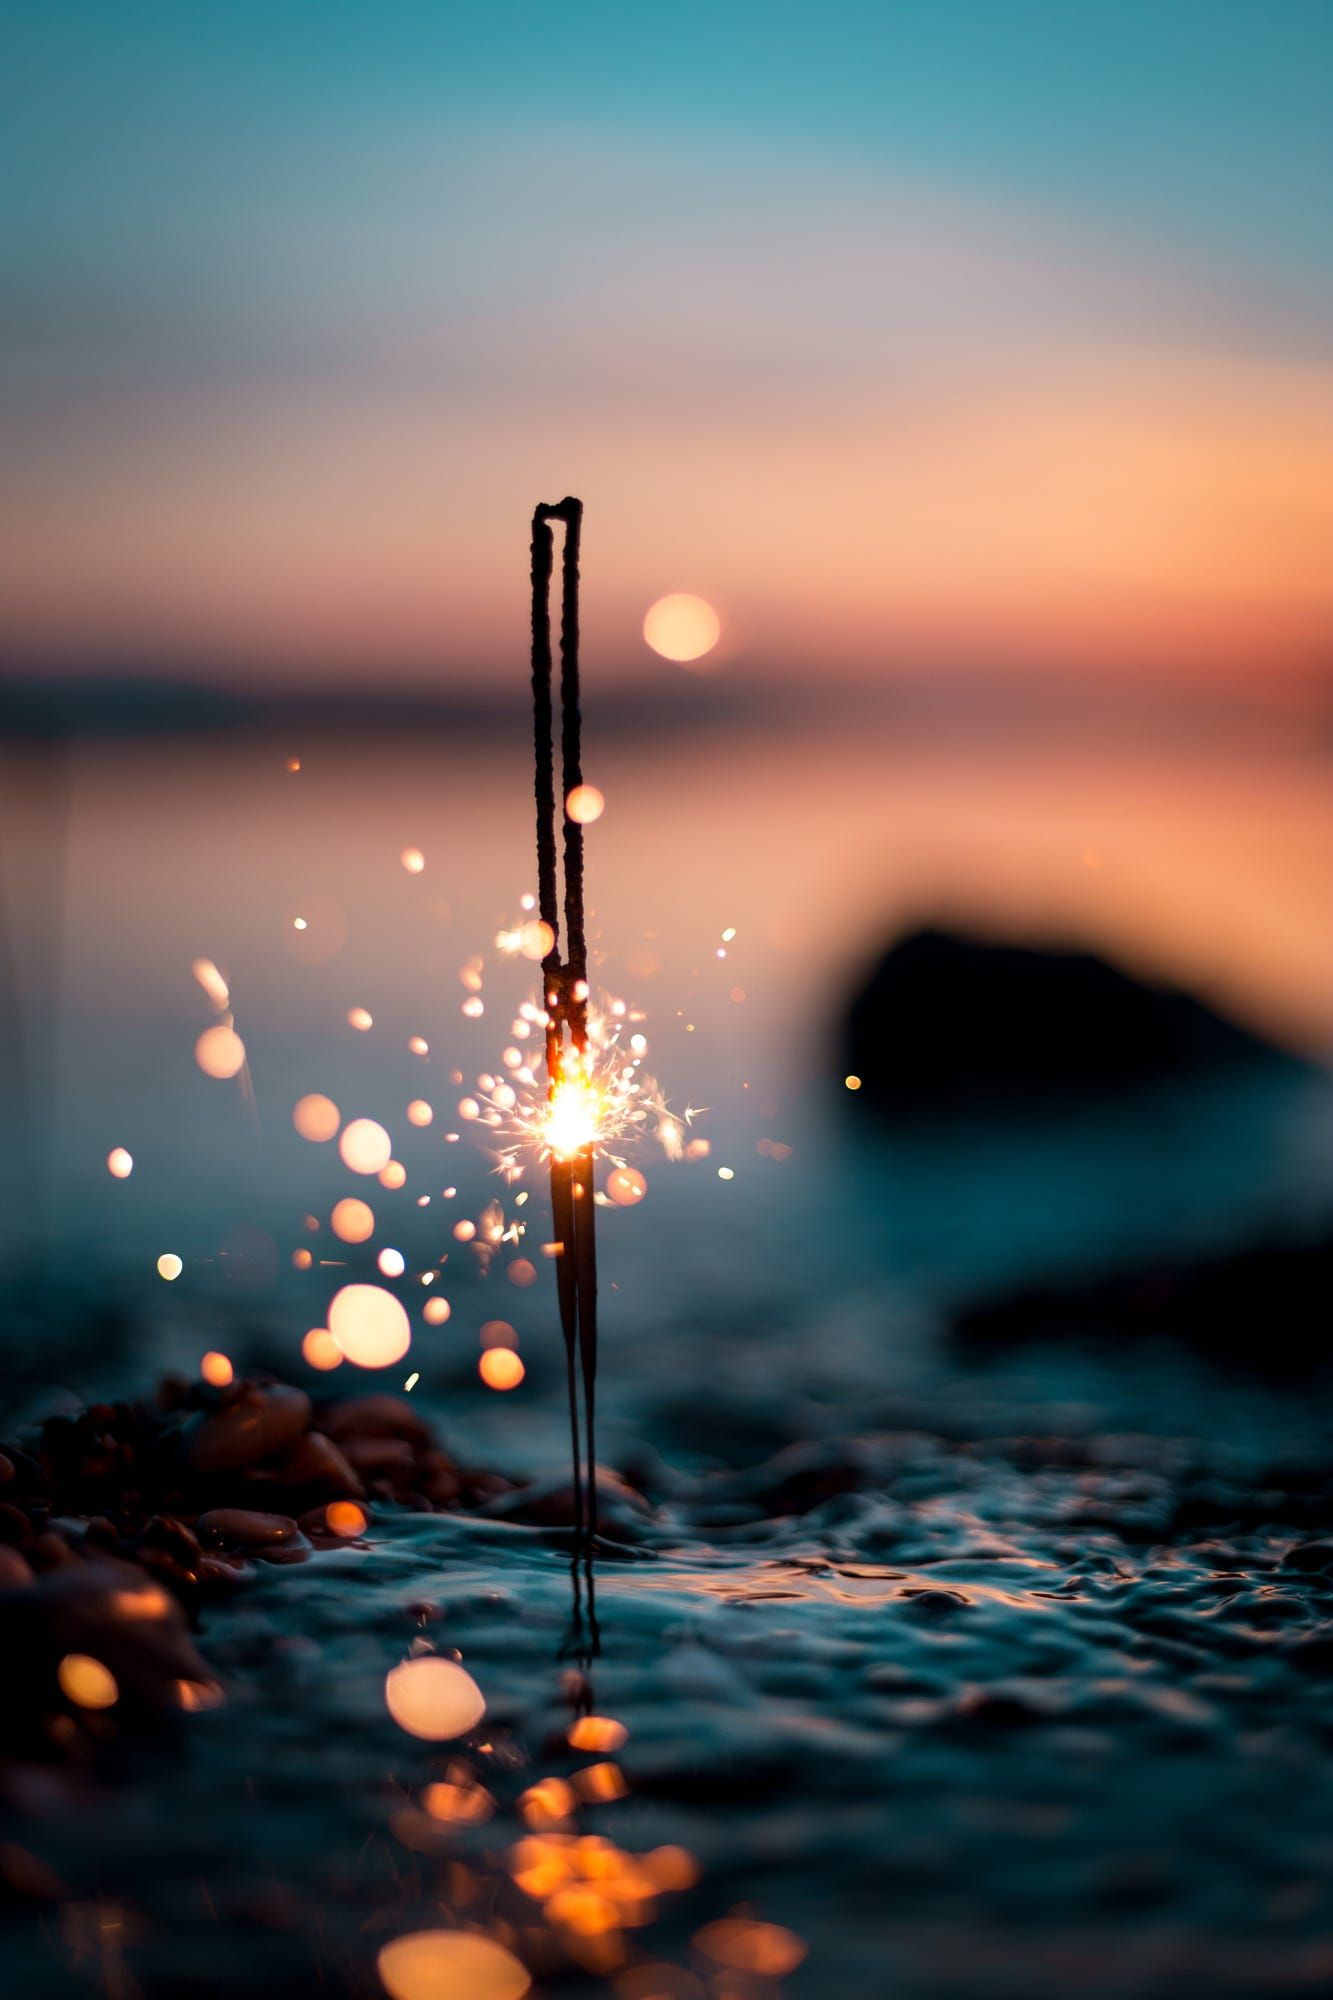 Sunset Sparkle Moonlight Photography Fairy Light Photography Breathtaking Photography